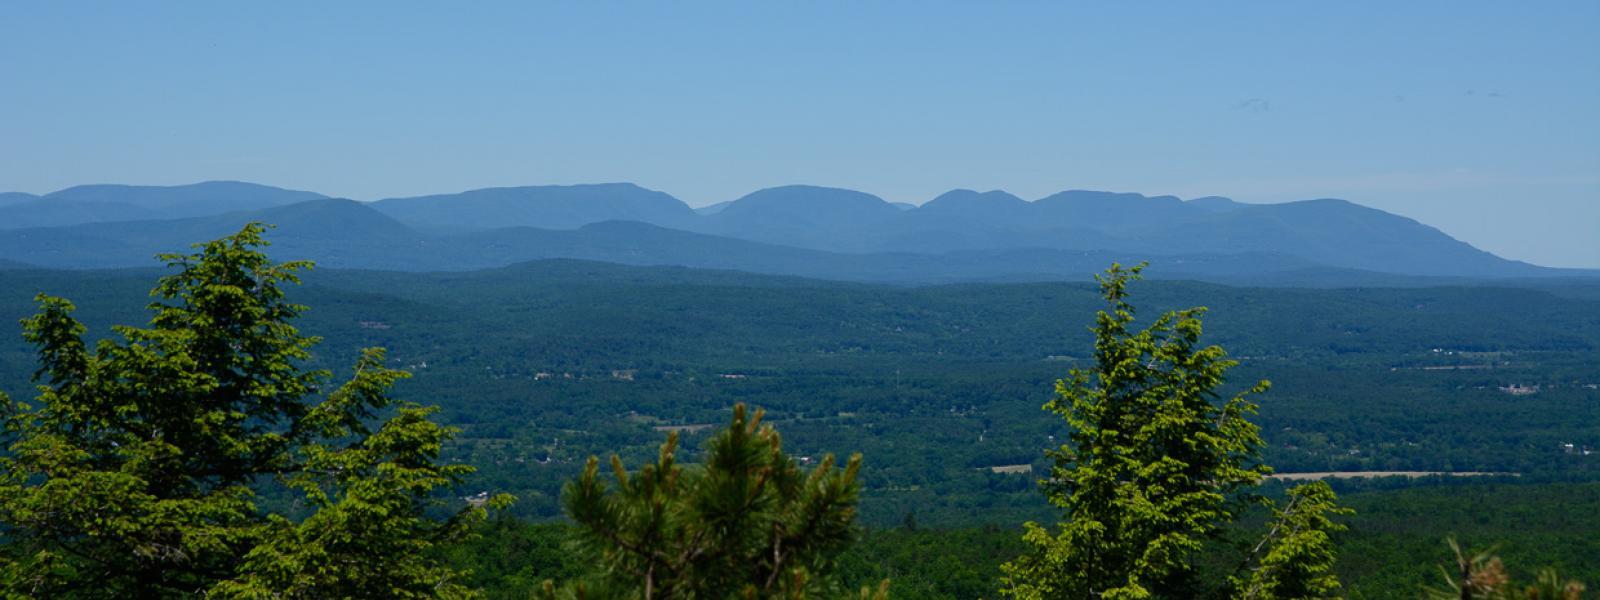 View of Catskills from Beacon Hill Minnewaska State Park - Bill Roehrig